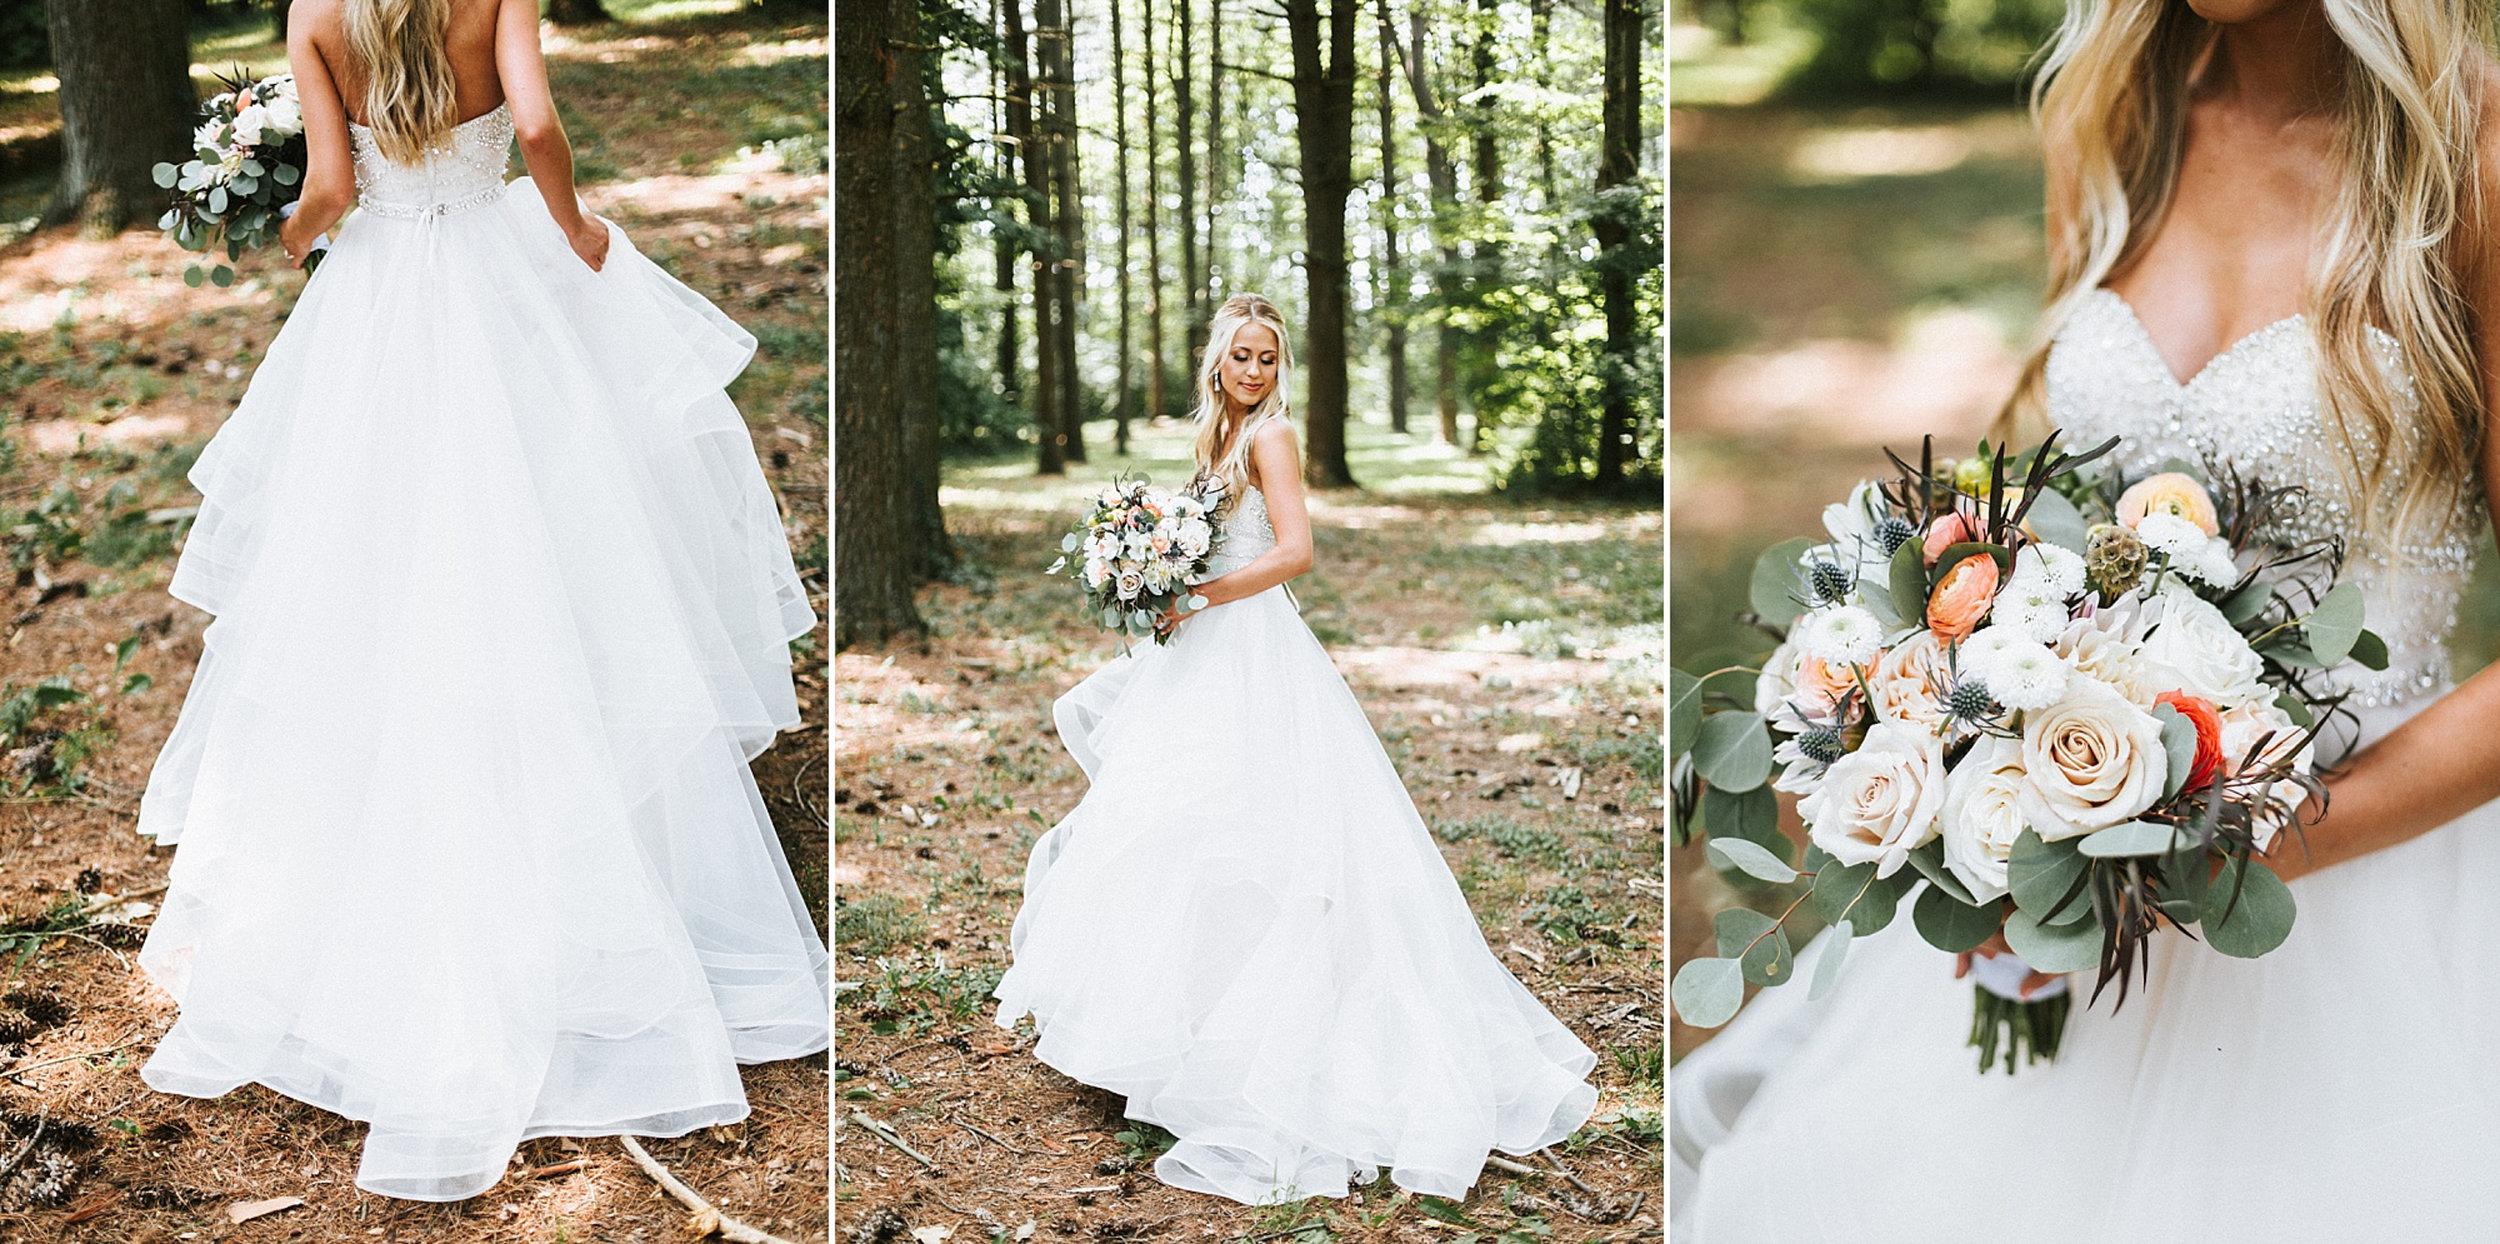 Brooke Townsend Photography - Cincinnati Wedding Photographer (20 of 153).jpg